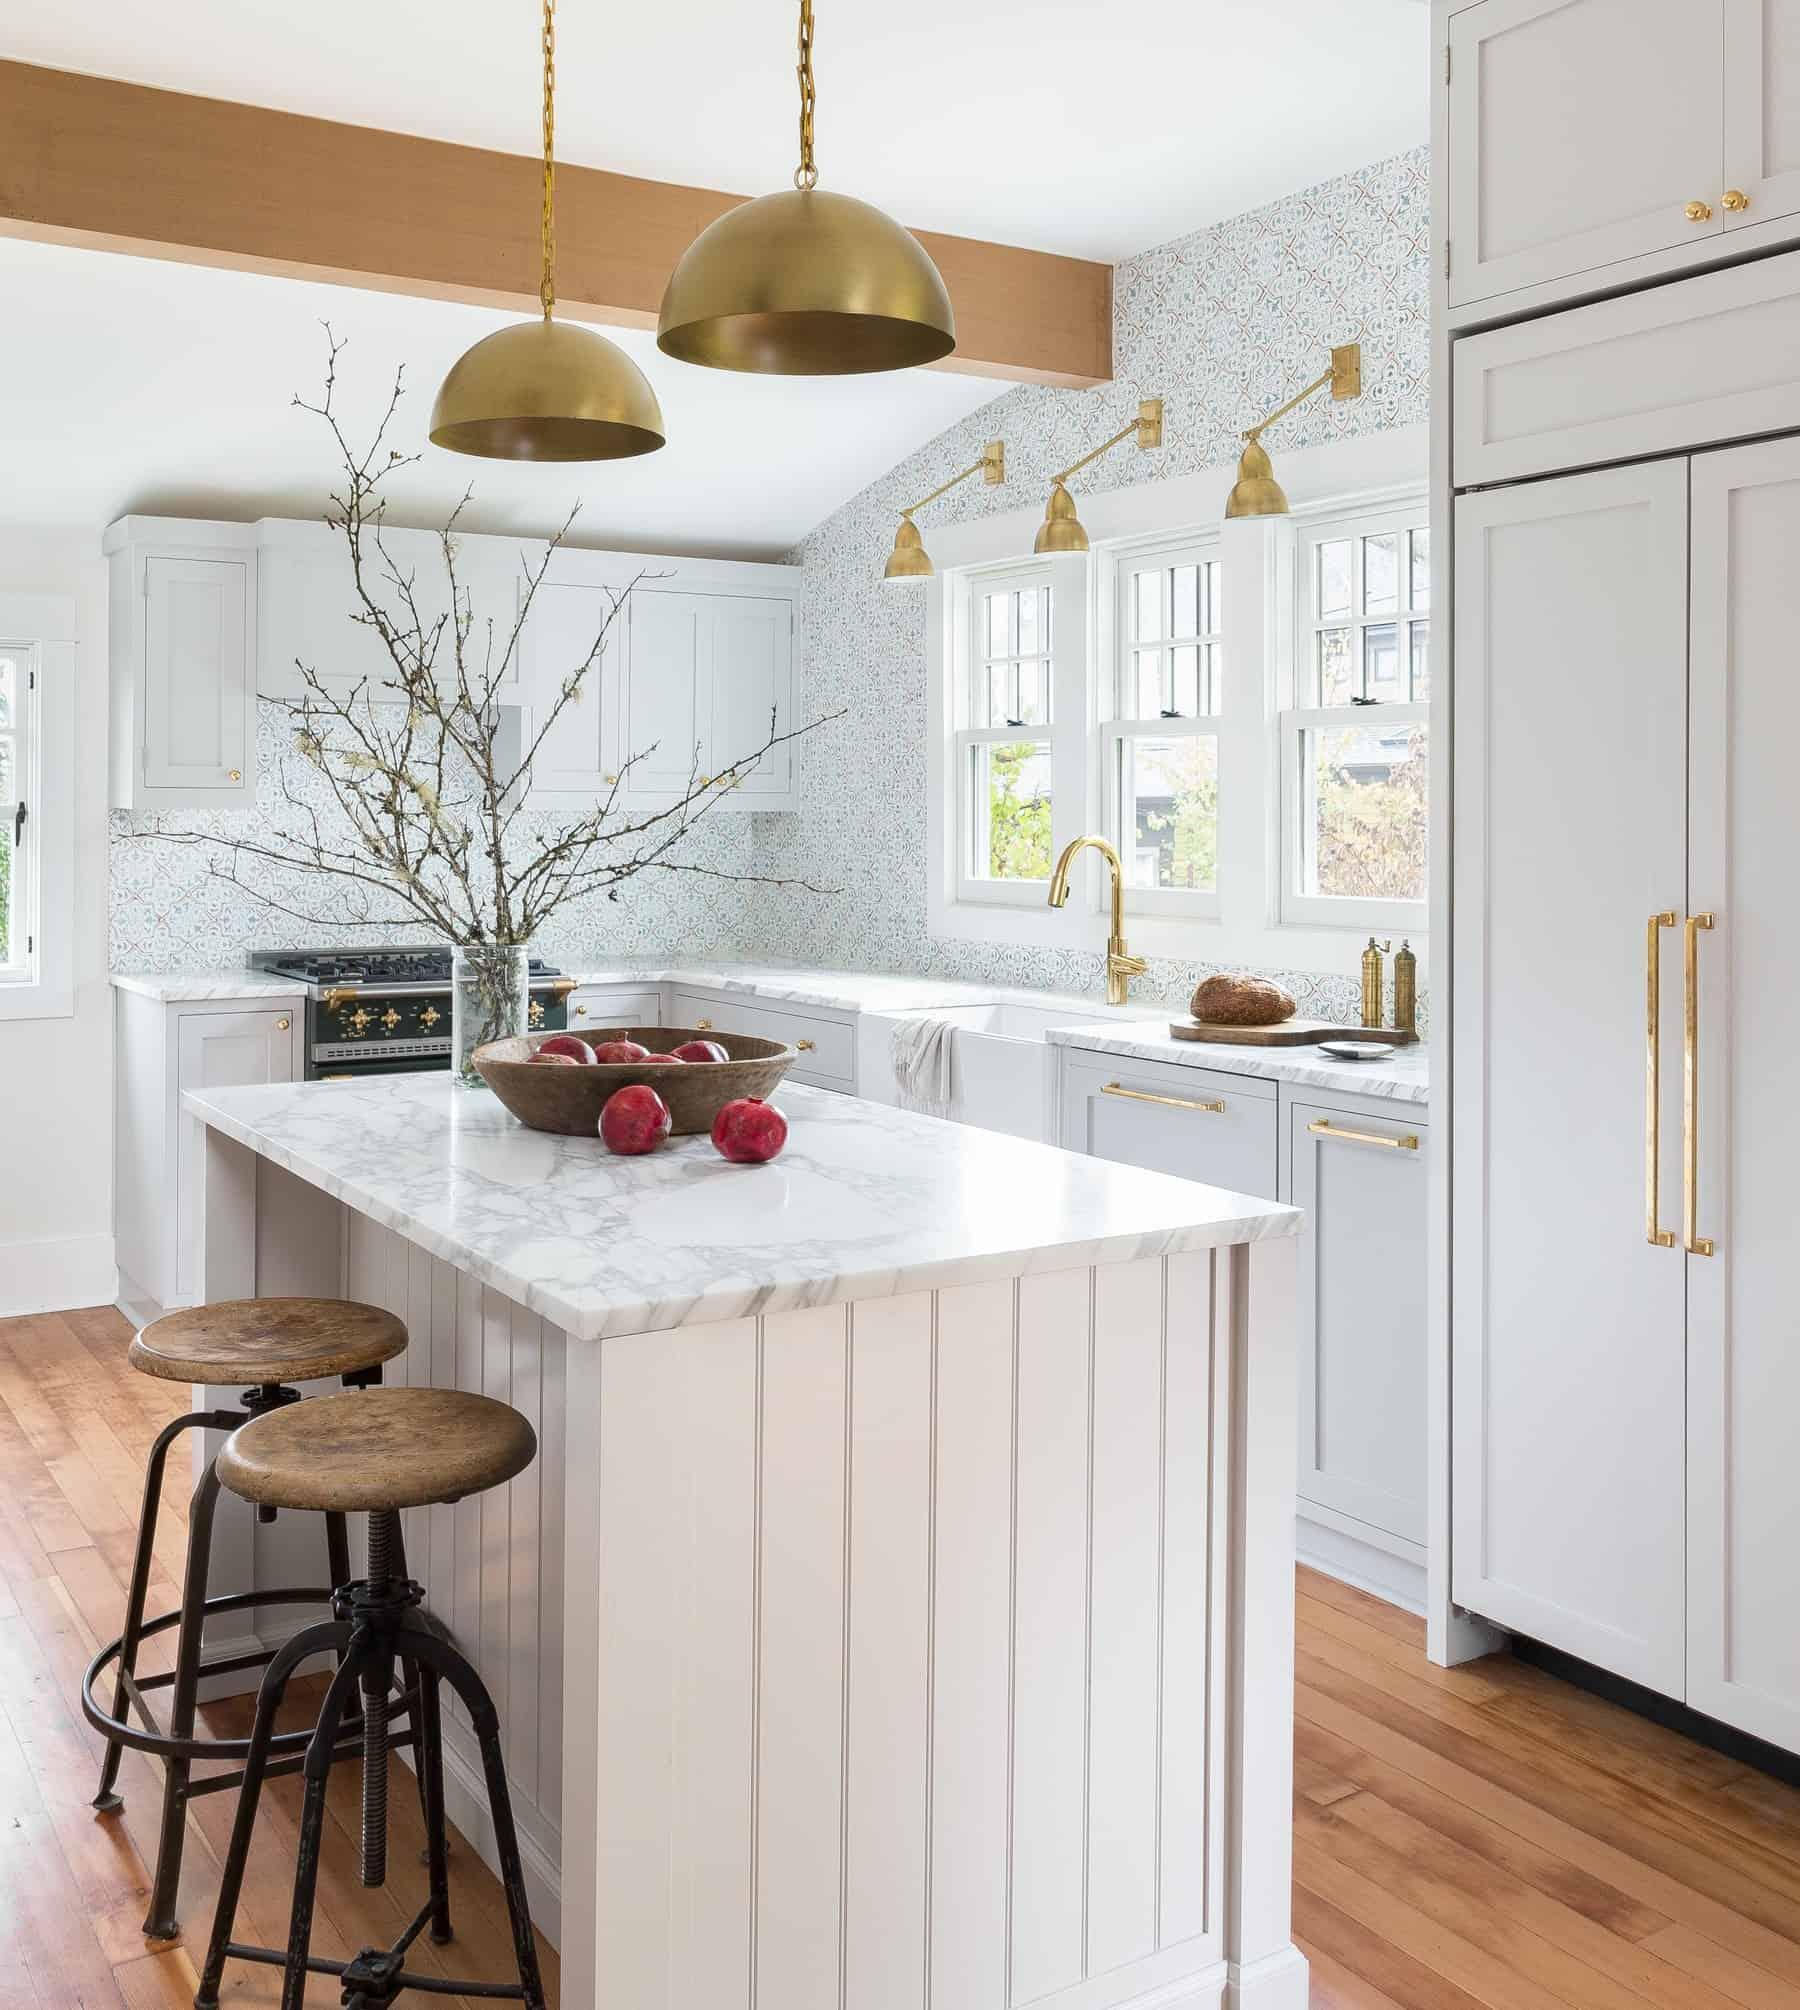 Brilliant Small Kitchen Island Kitchen Interior Decoration: Heidi Caillier